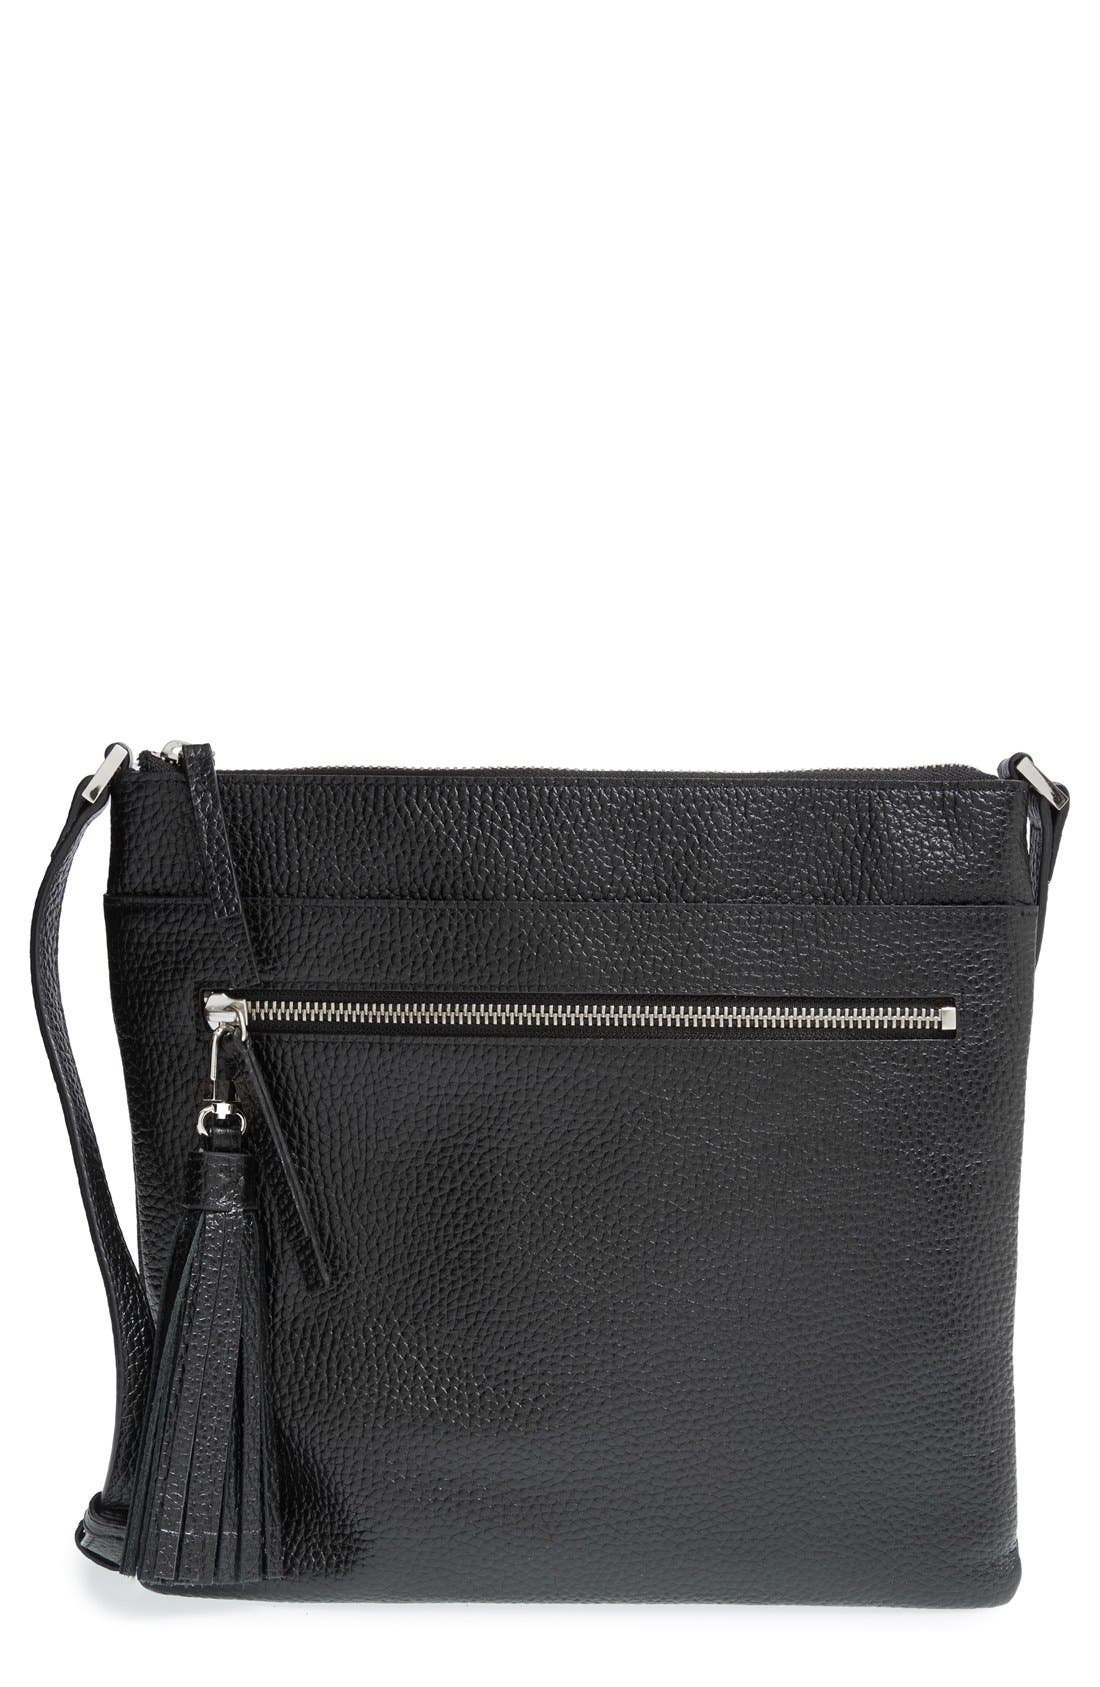 HALOGEN<SUP>®</SUP>, Tasseled Leather Crossbody Bag, Main thumbnail 1, color, 001